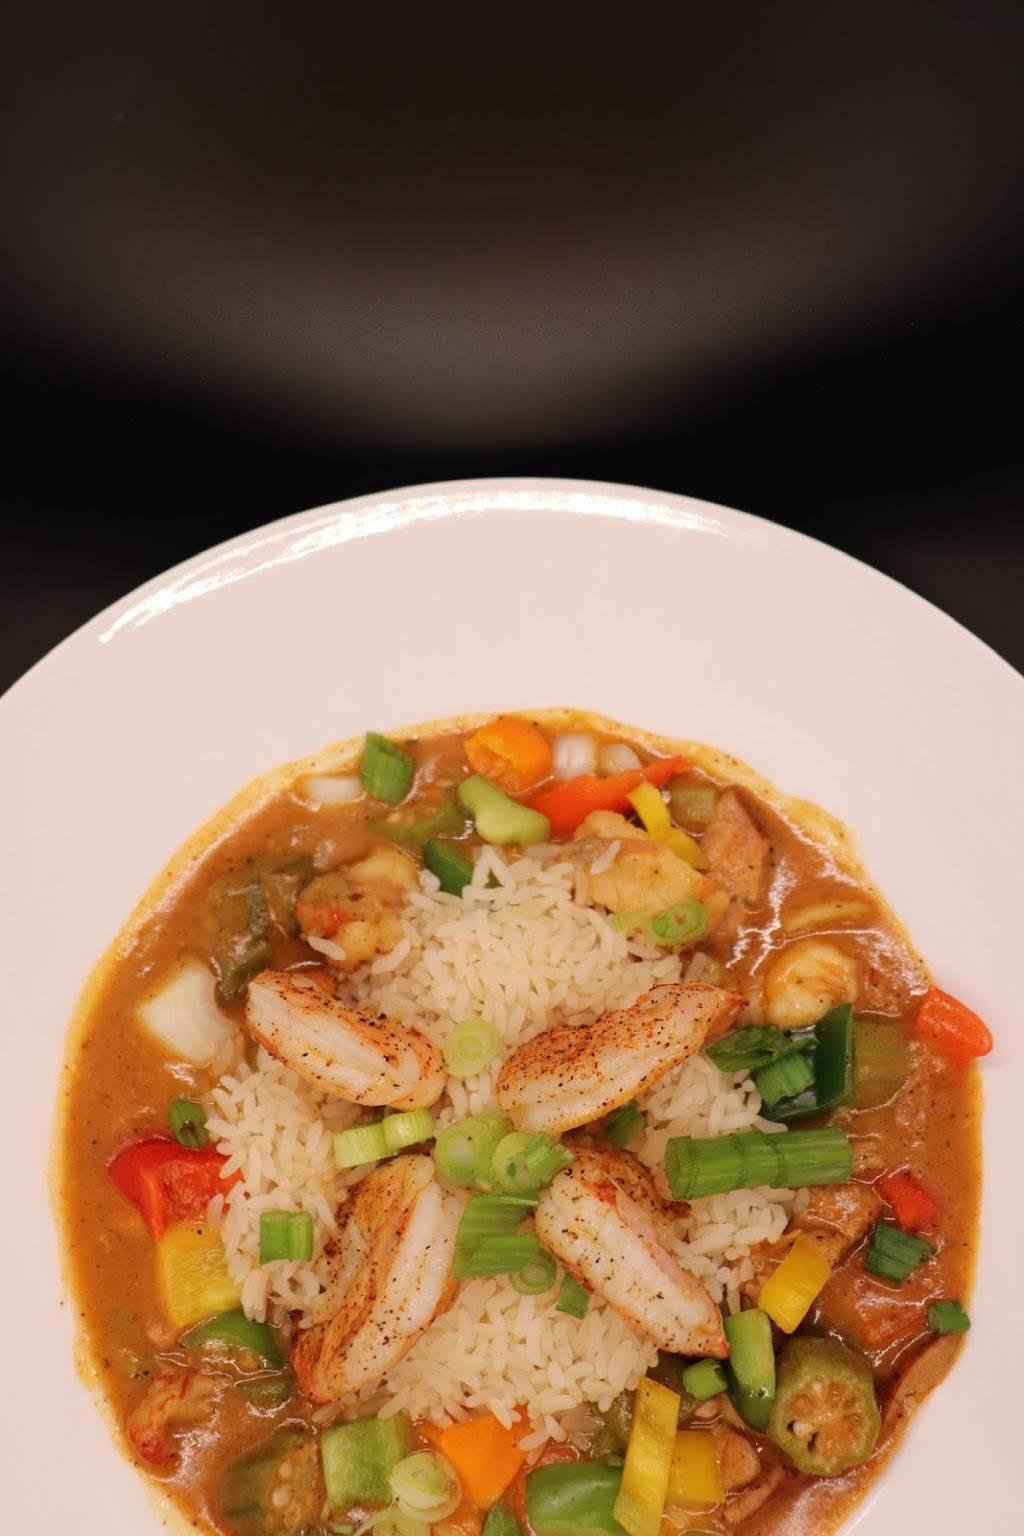 GOAT SPORTS LOUNGE   restaurant   402 GA-155 S, McDonough, GA 30253, USA   4703179757 OR +1 470-317-9757